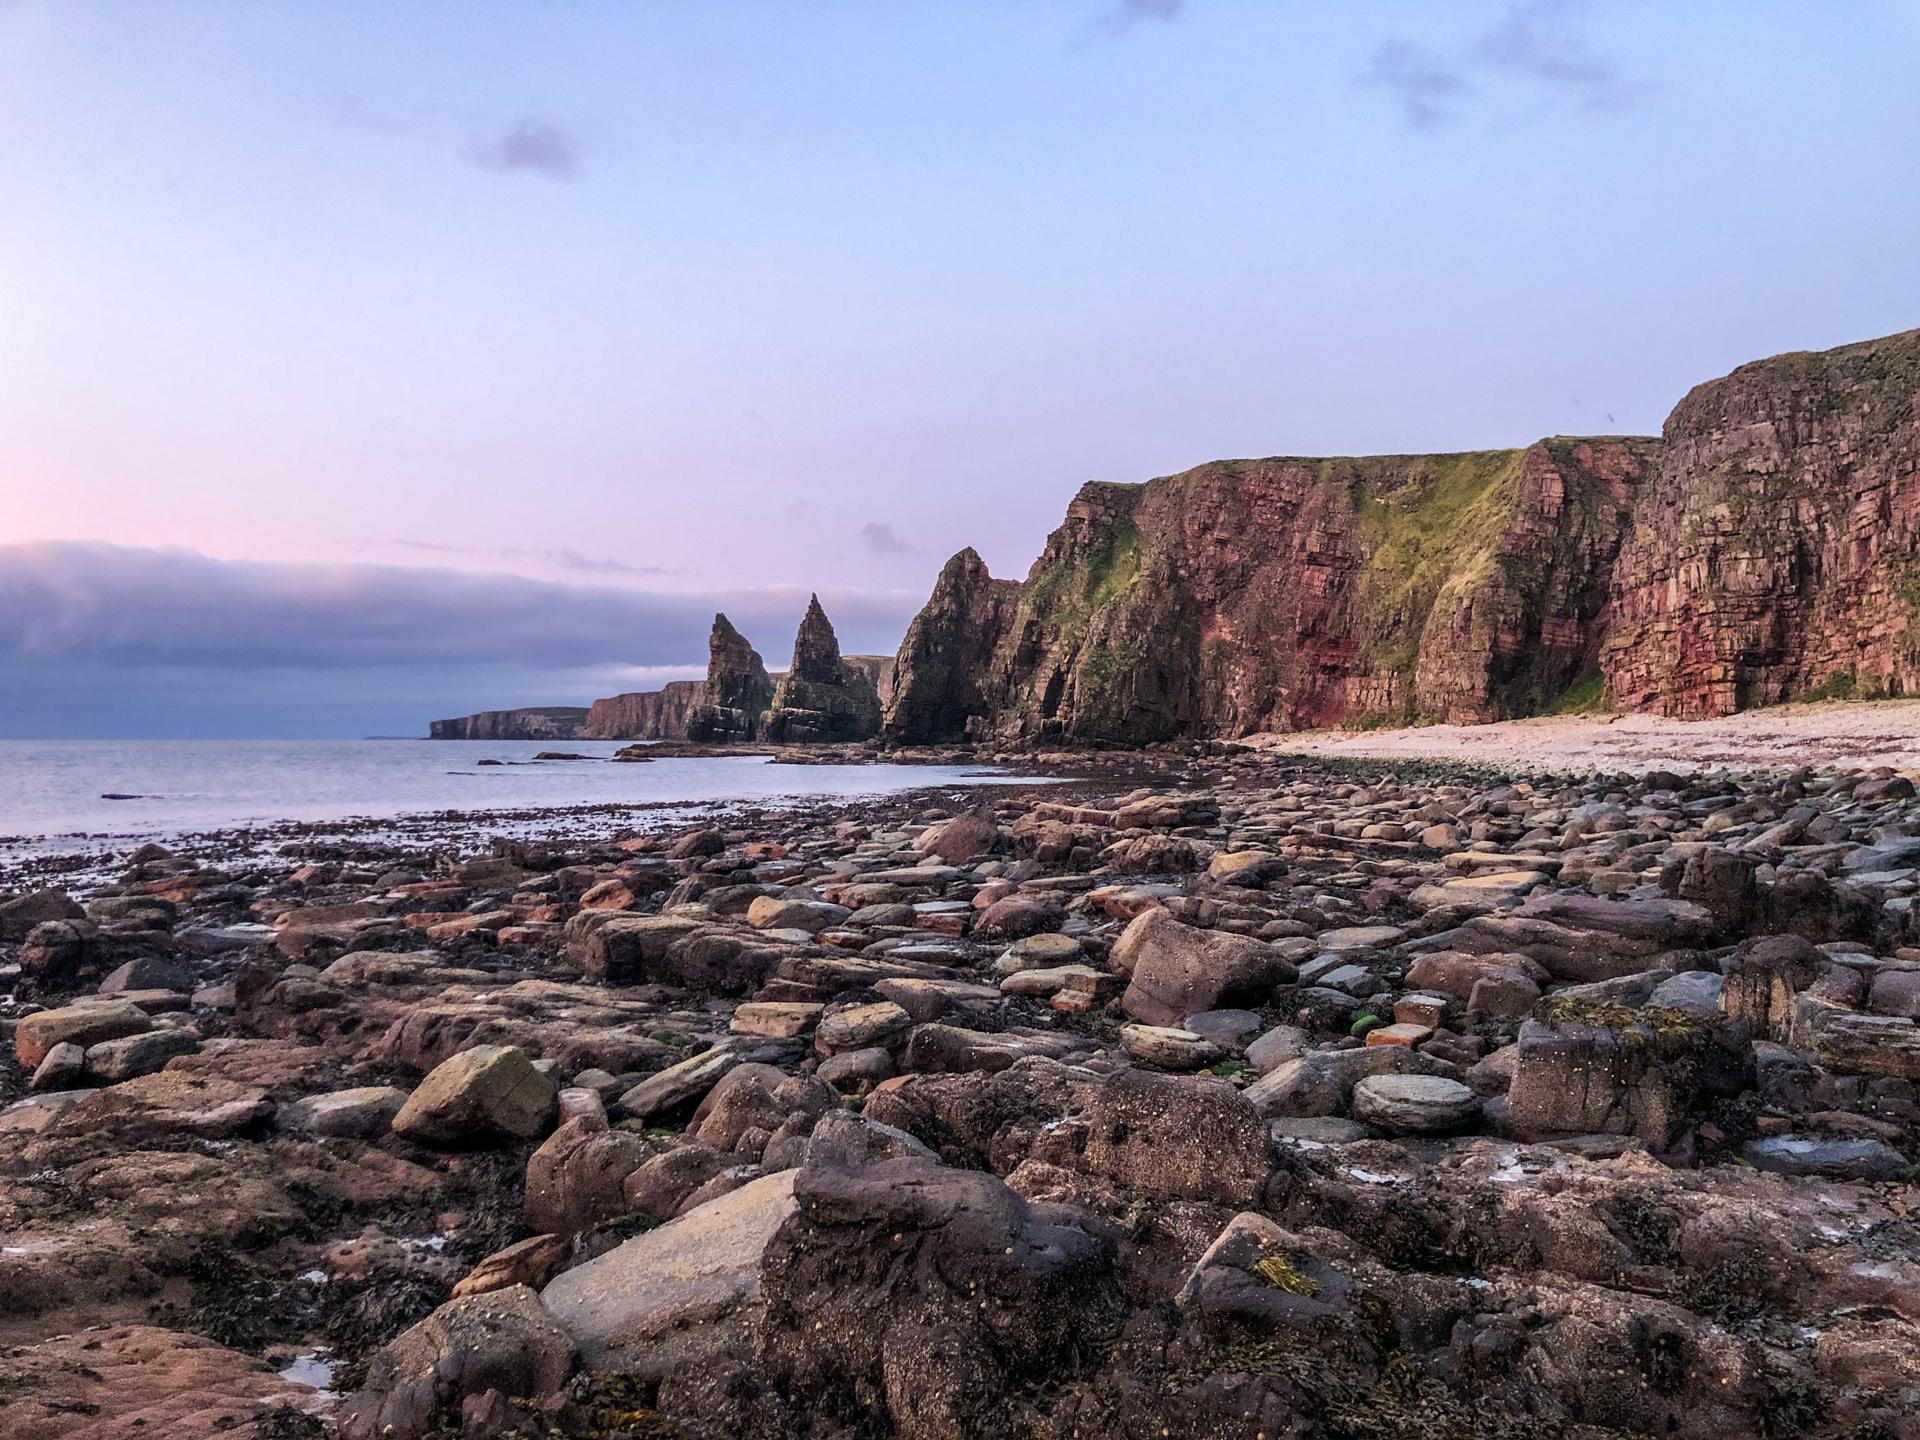 Seascape at a rocky shoreline